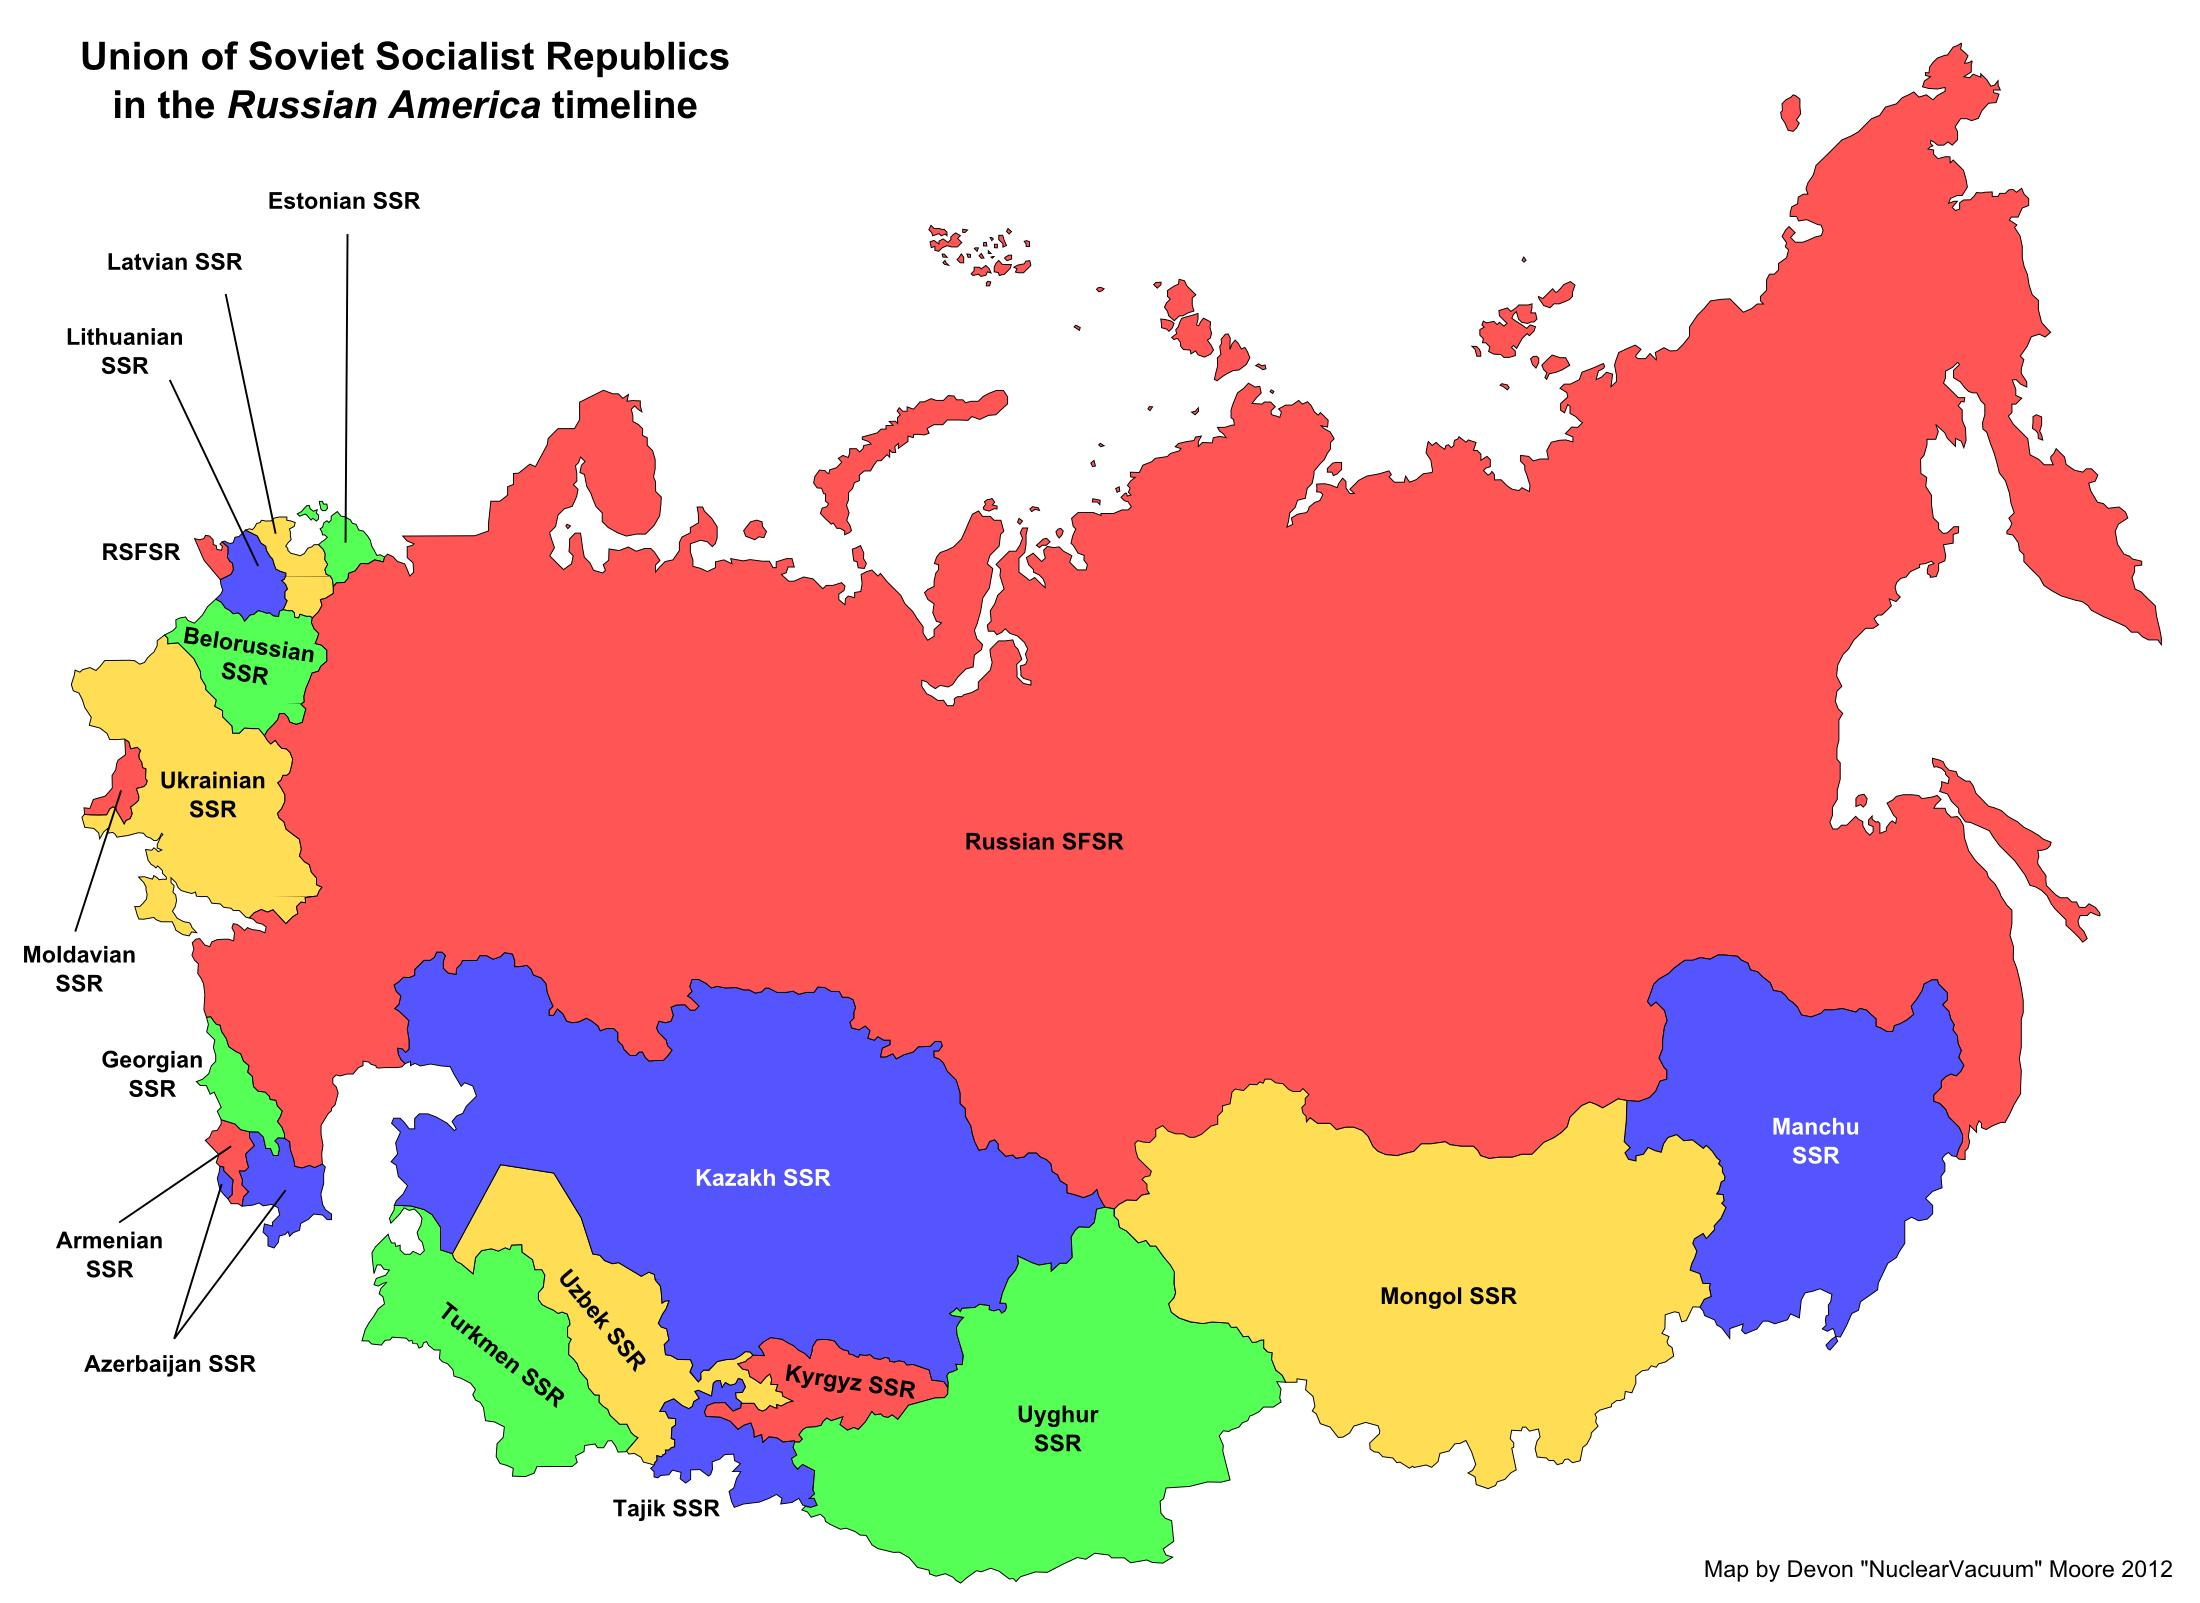 sovjetunionen kart Kart av Sovjetunionen   Sovjetiske kart (Øst Europa   Europa) sovjetunionen kart